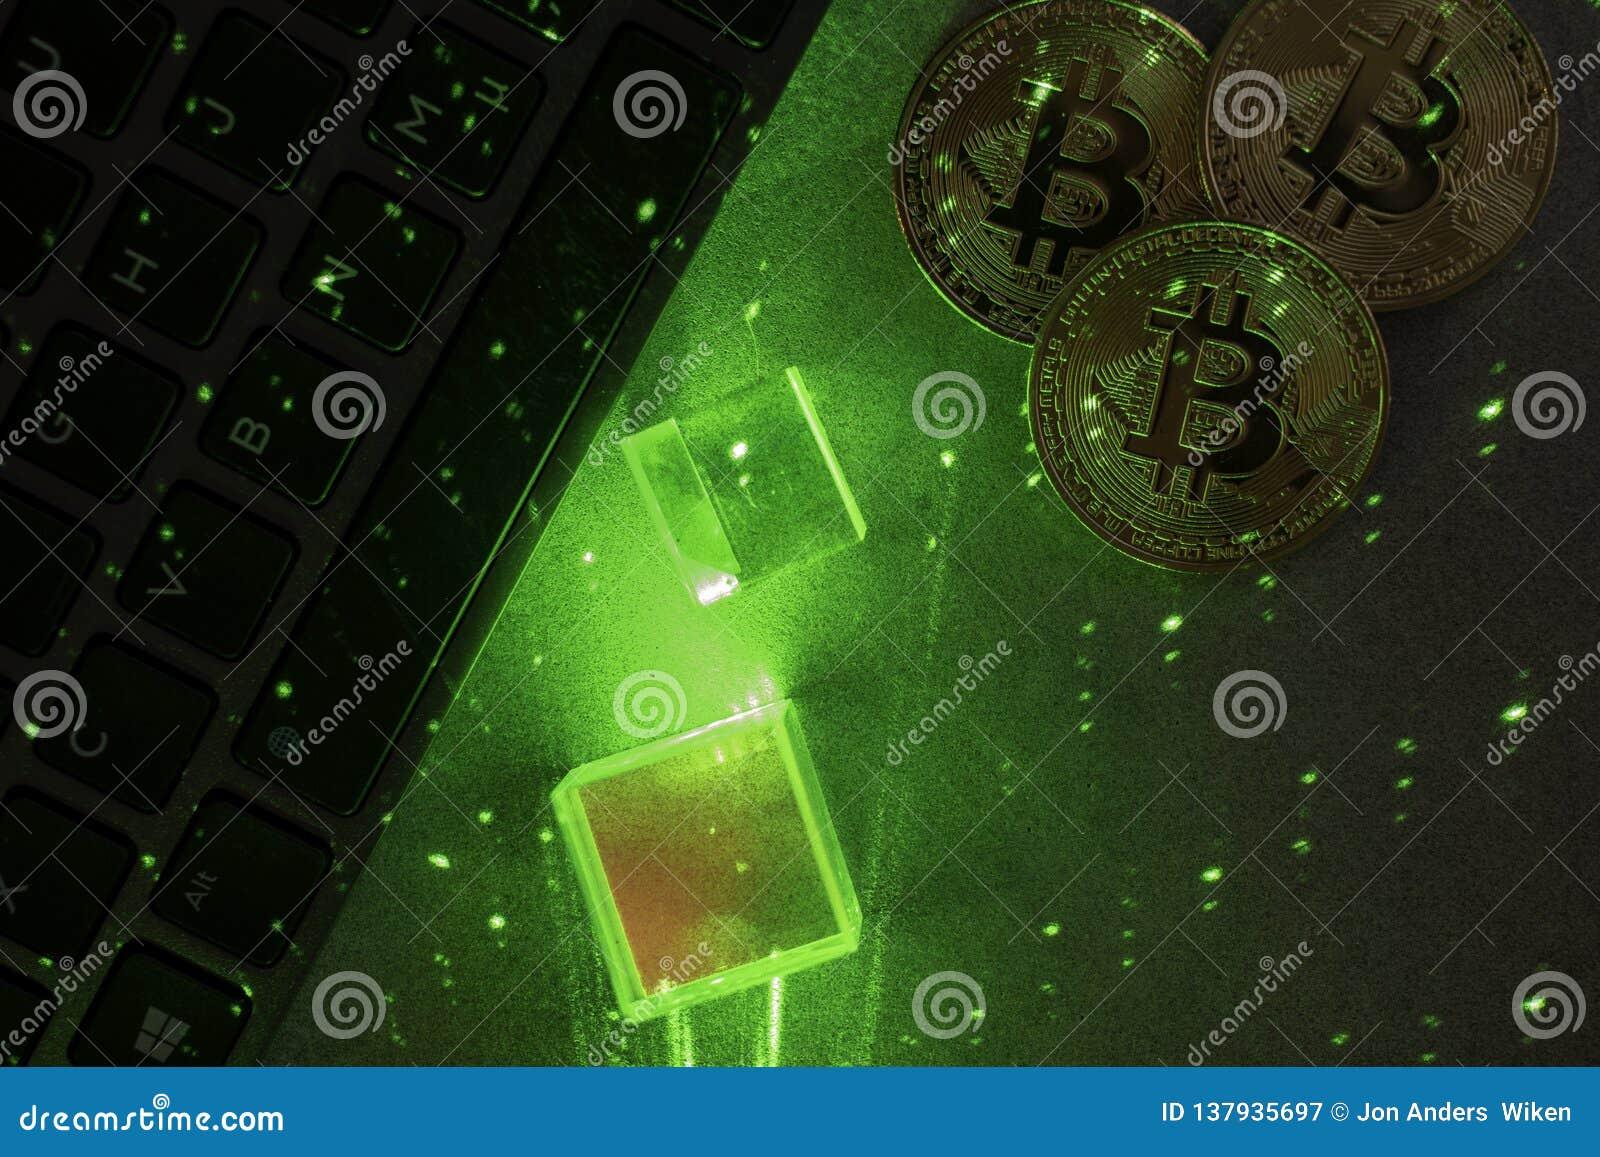 tastiera laser btc)